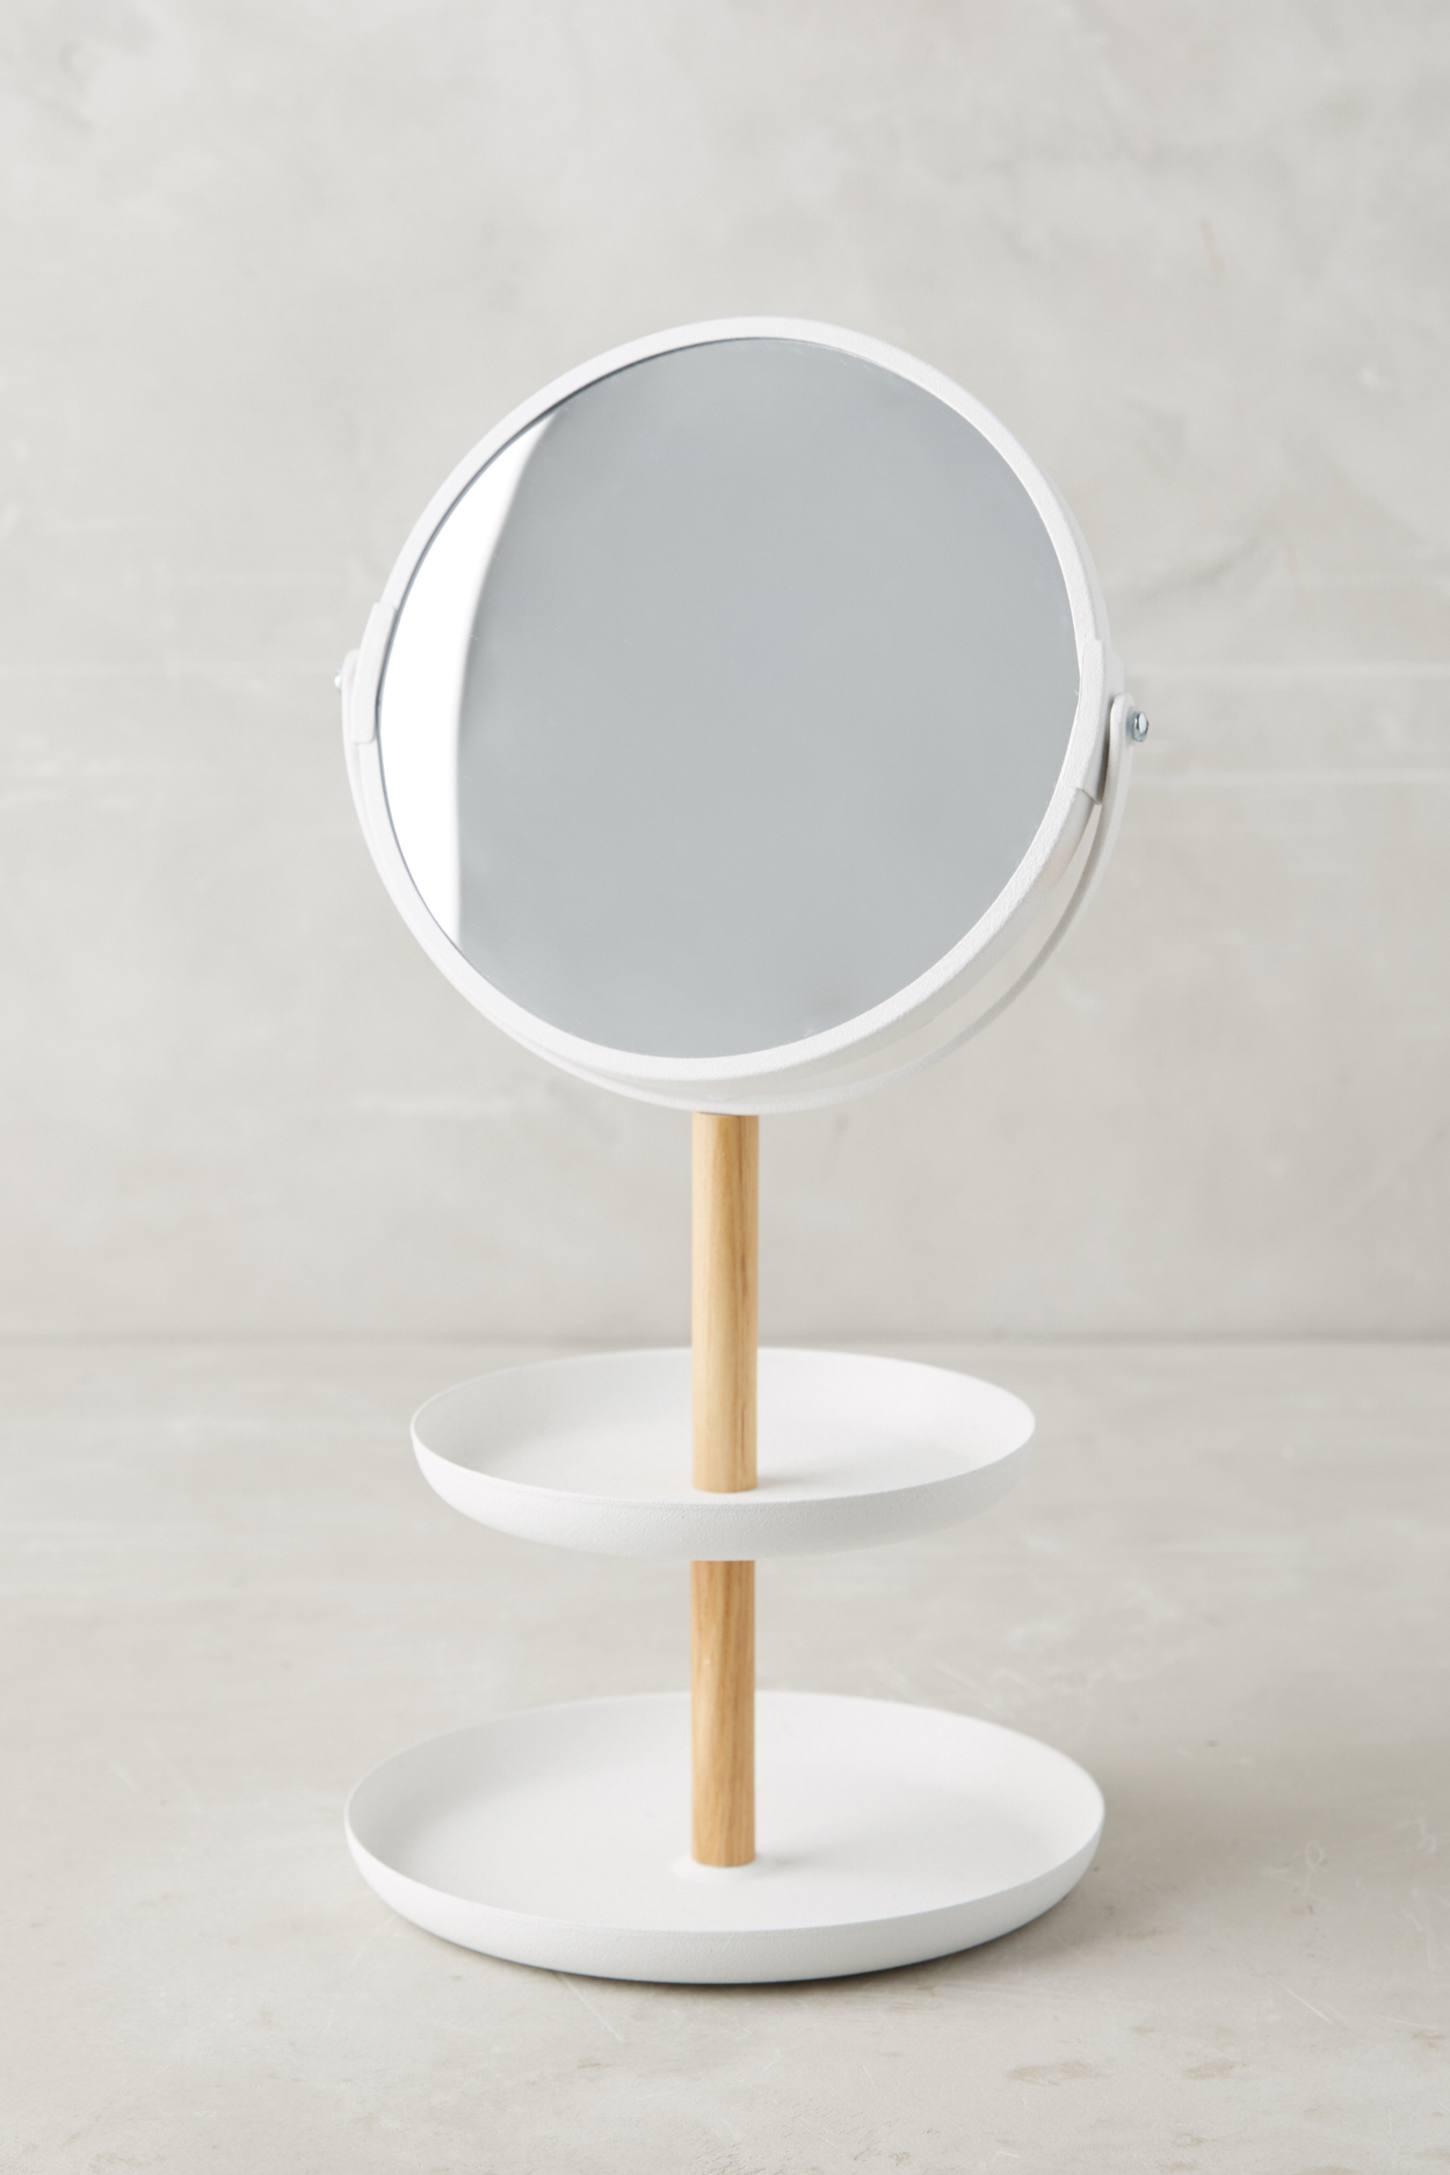 Tiered Vanity Mirror Anthropologie - Mirror on a stand vanity